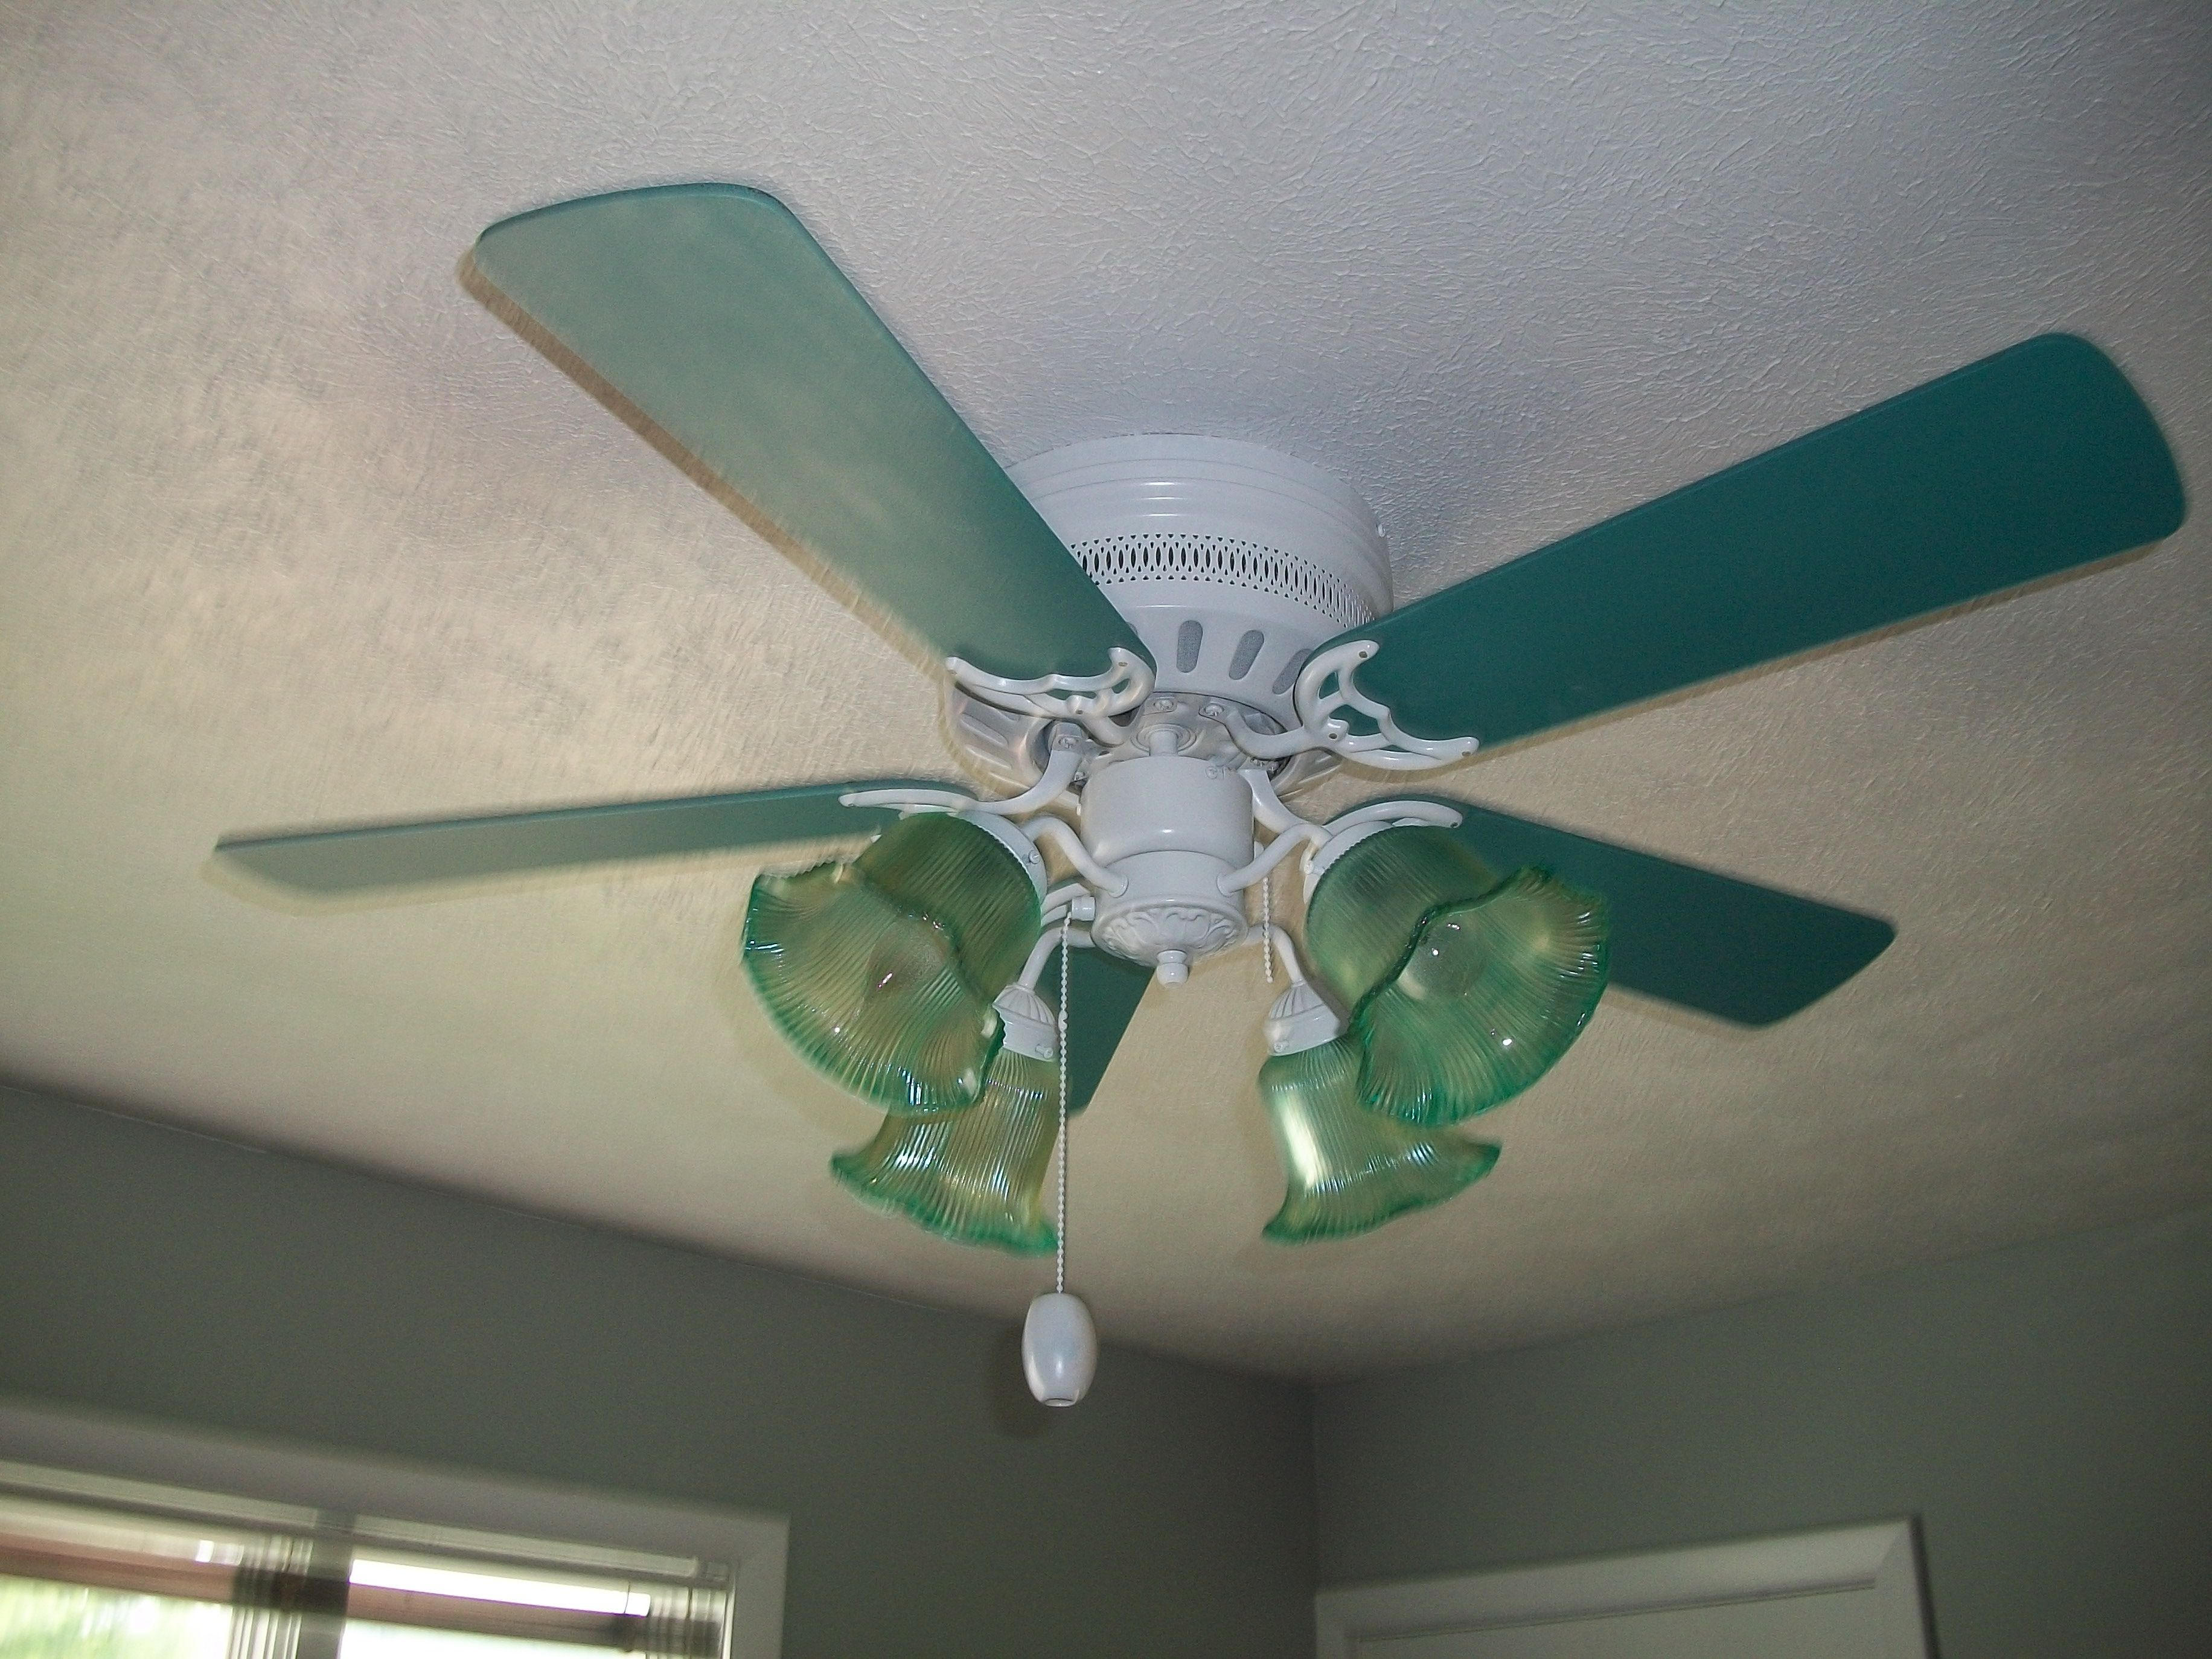 Redone ceiling fan redesigned pinterest for Repurpose ceiling fan motor